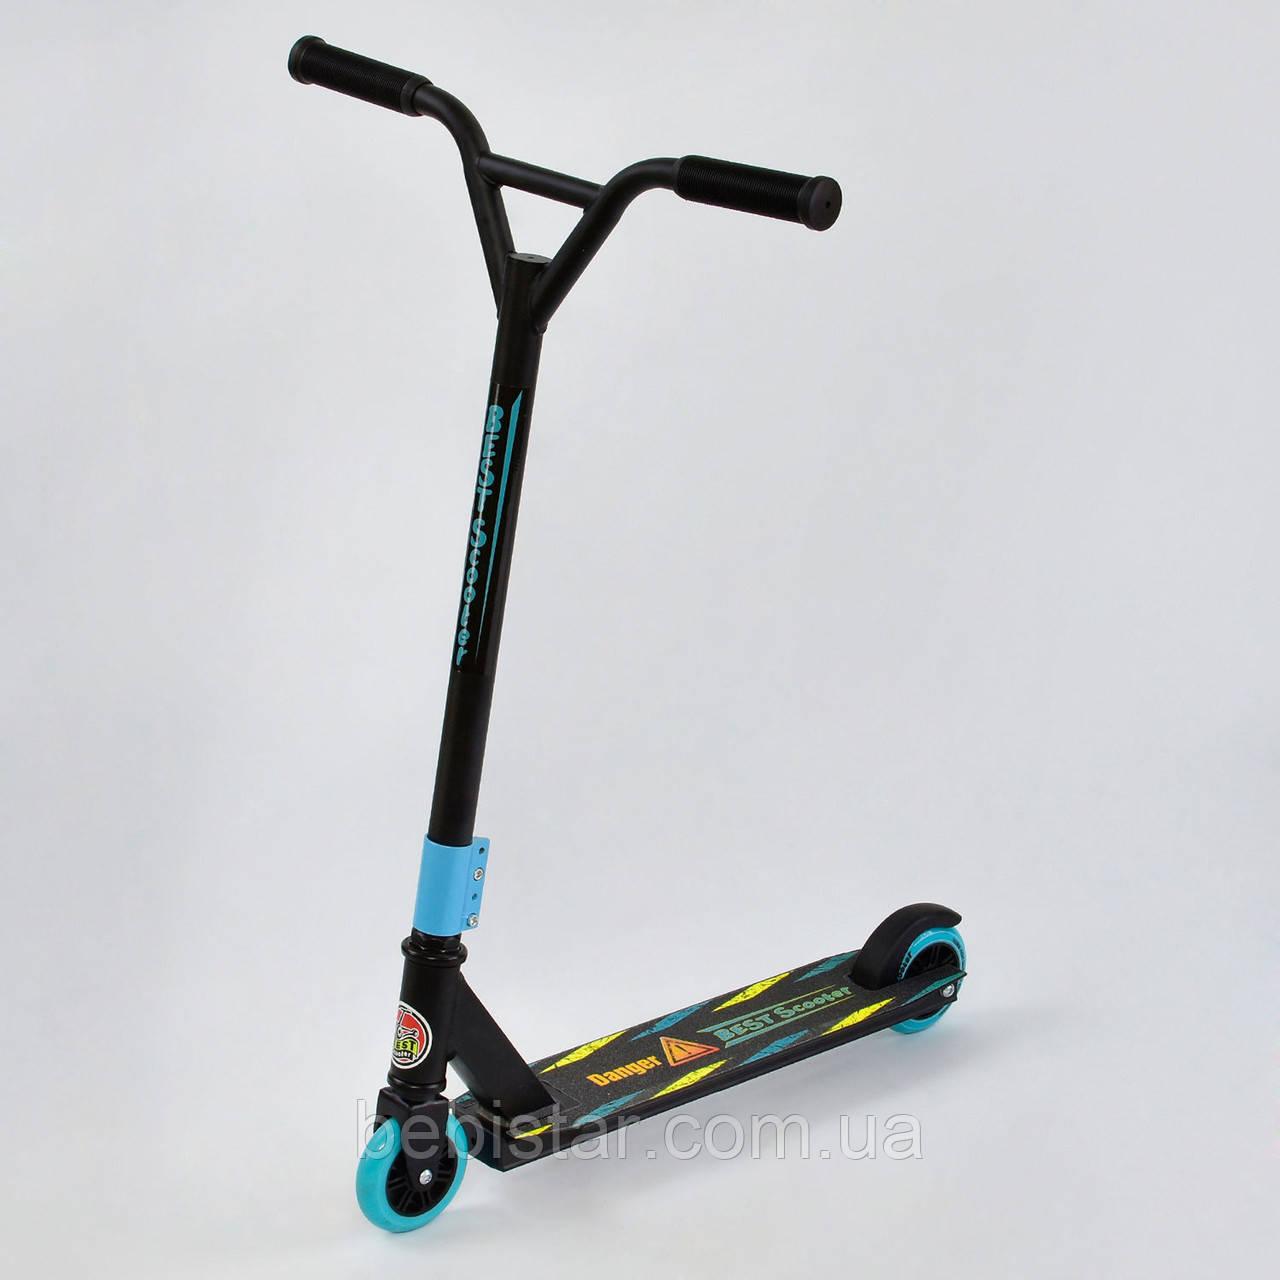 Самокат трюковий чорна рама блакитні колеса Best Scooter